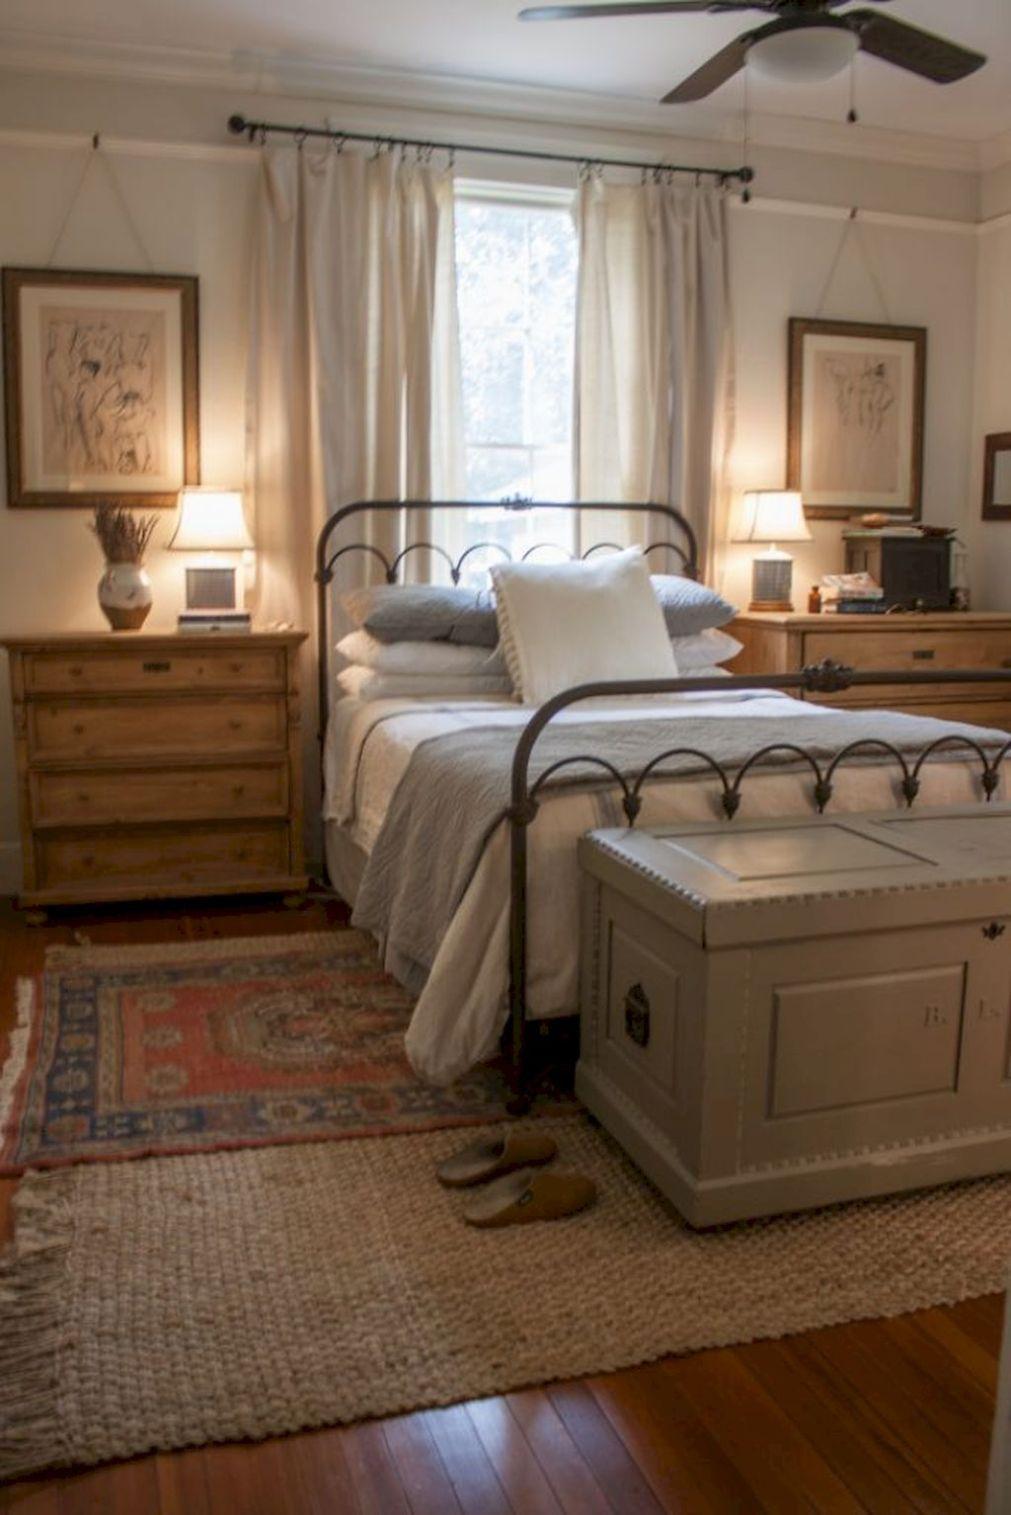 Beautiful Rustic Farmhouse Master Bedroom Ideas 33 Remodel Bedroom Master Bedrooms Decor Farmhouse Master Bedroom